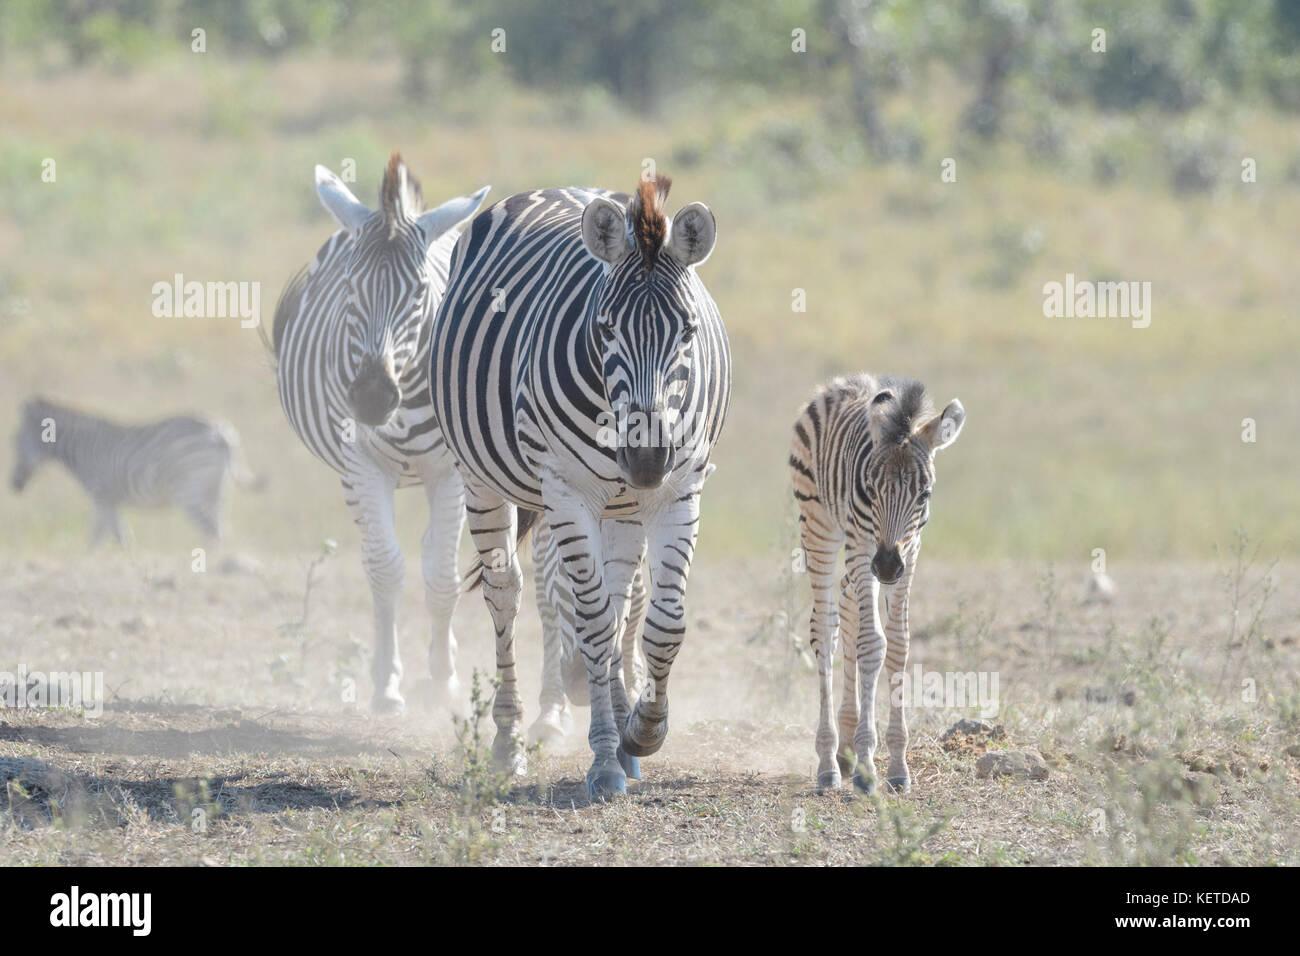 Le pianure zebra (Equus quagga) madre e puledro camminando sulla savana Kruger National Park, Sud Africa Immagini Stock